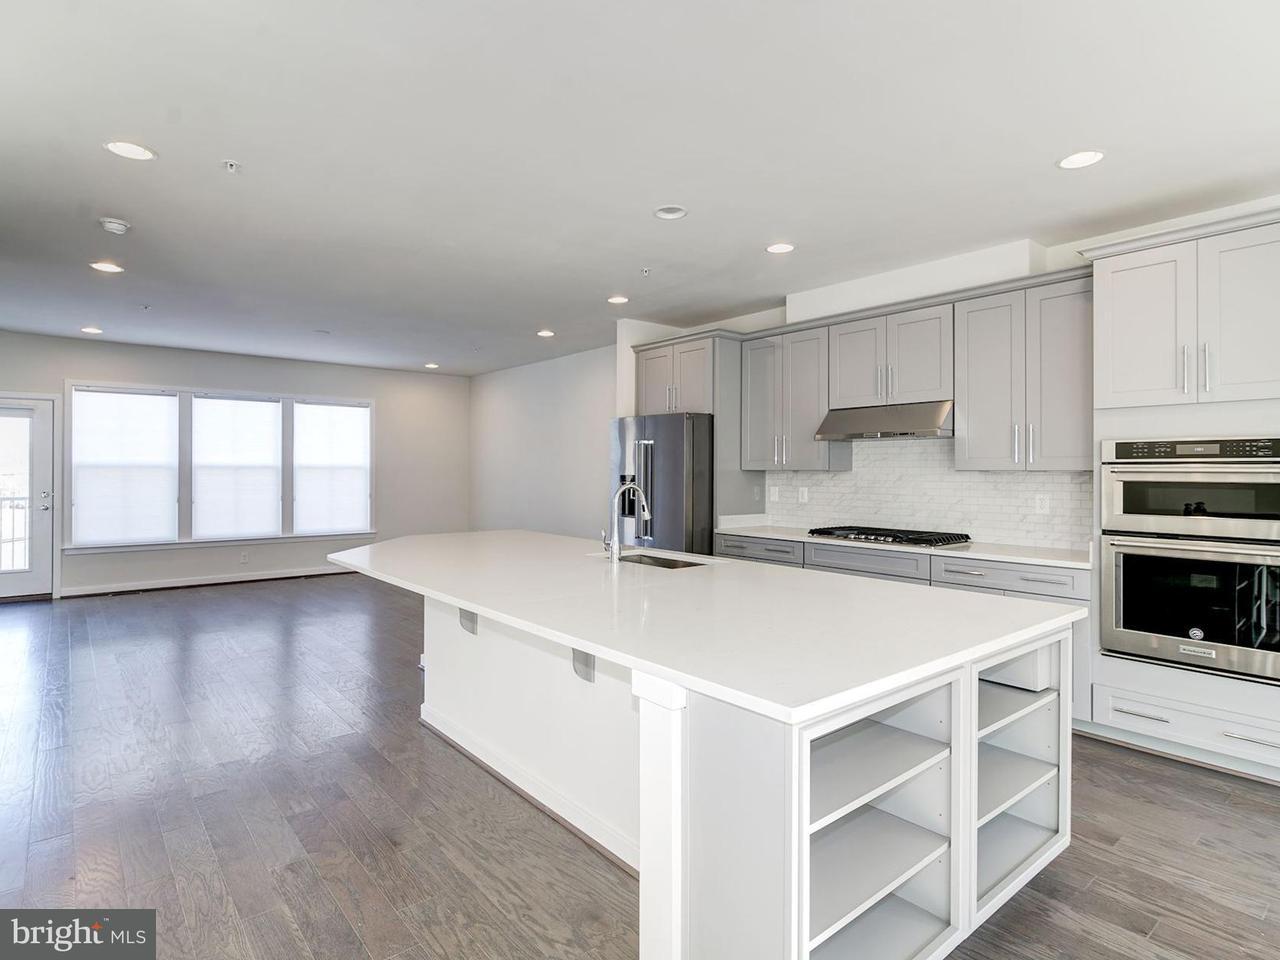 Additional photo for property listing at 10724 Viognier Ter 10724 Viognier Ter Fairfax, Виргиния 22030 Соединенные Штаты